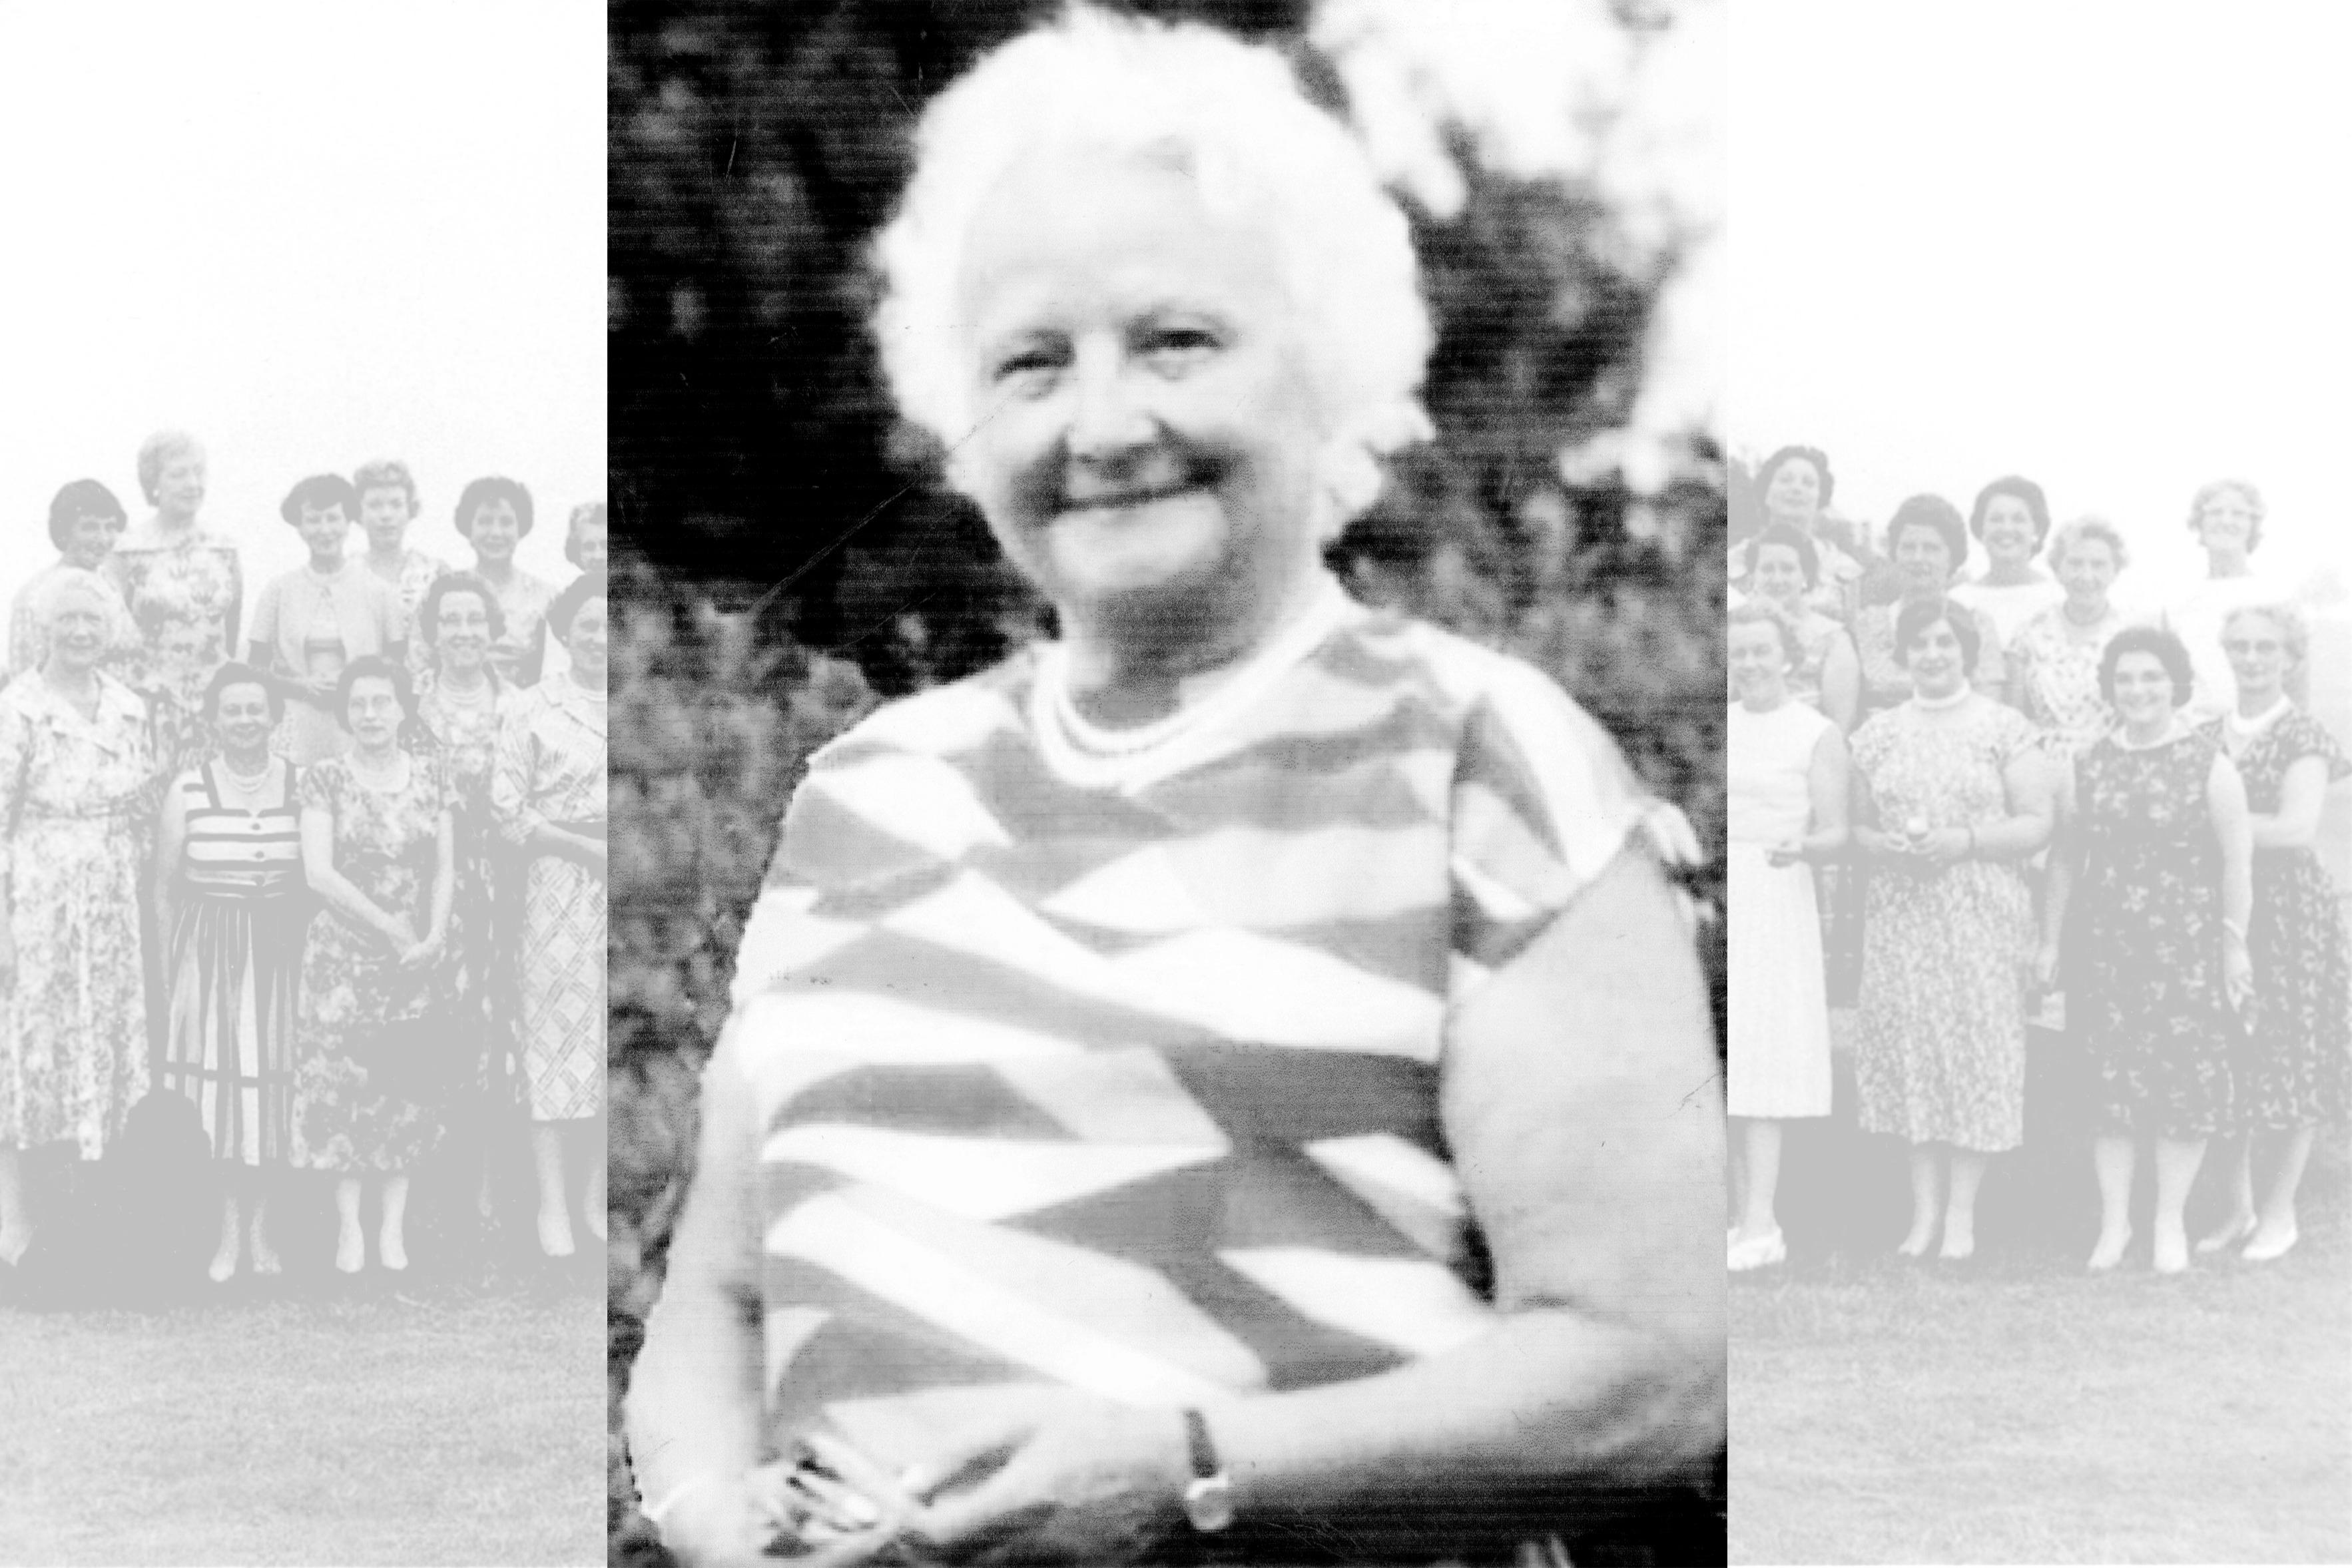 1973 - Alweena Beechner